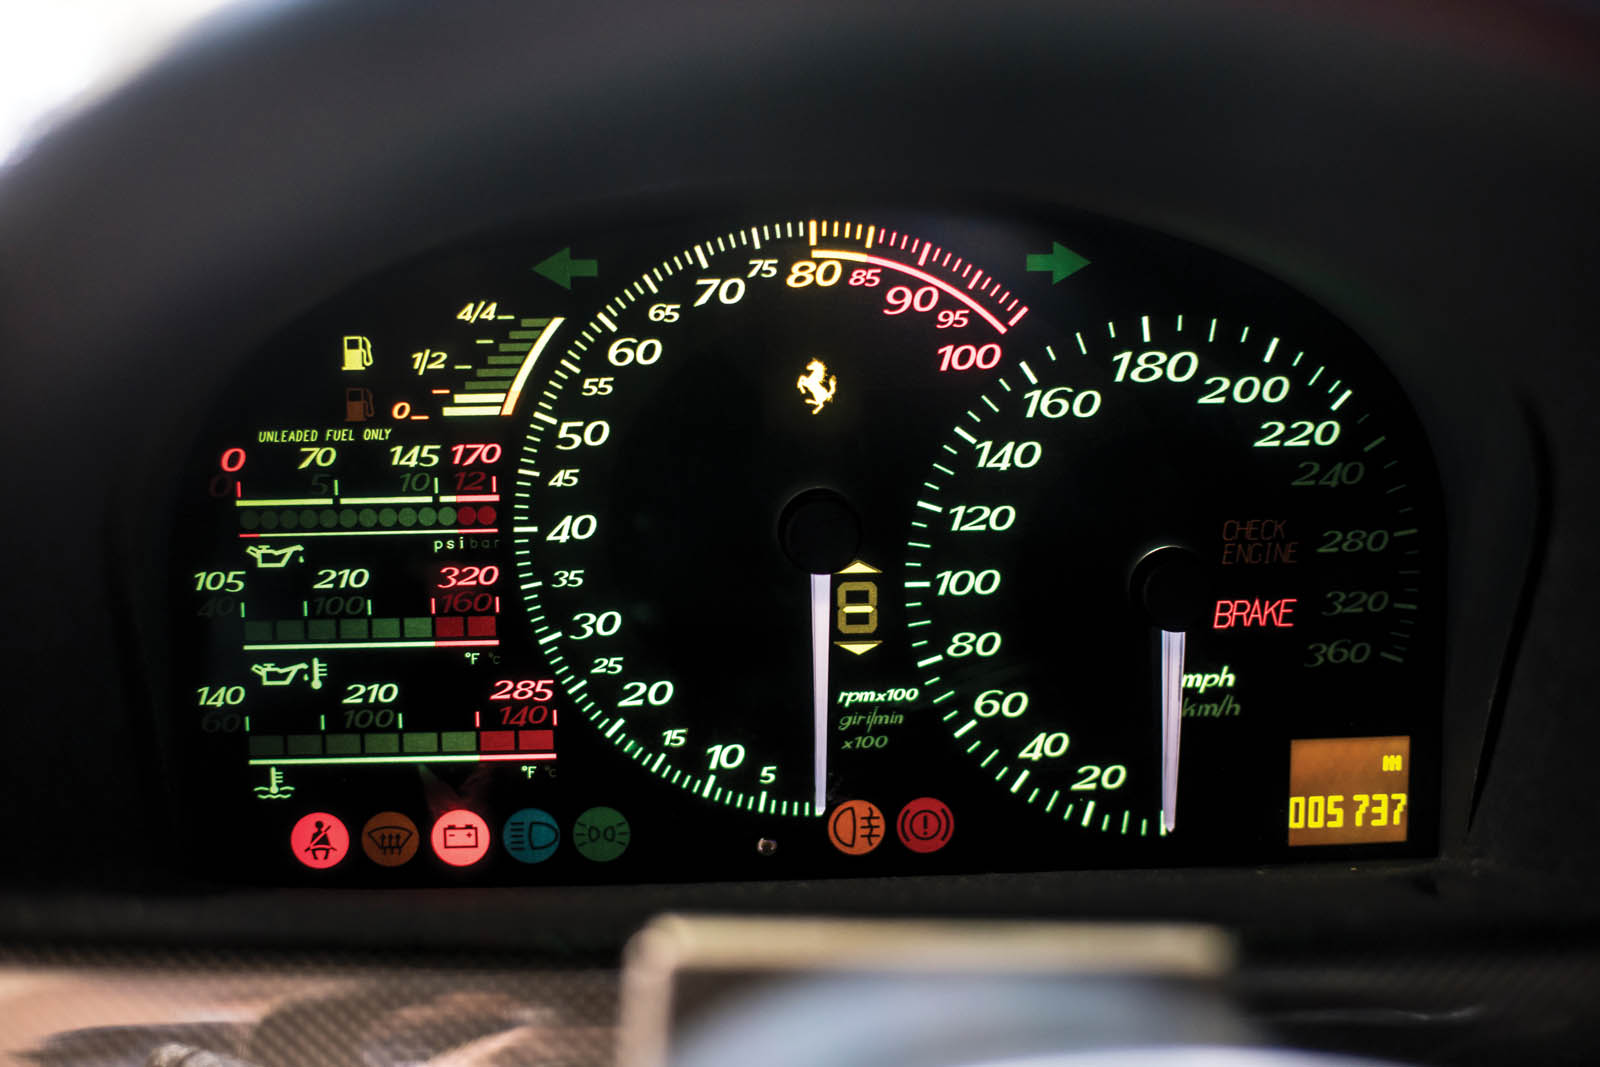 Mike_Tyson_Ferrari_F50_13